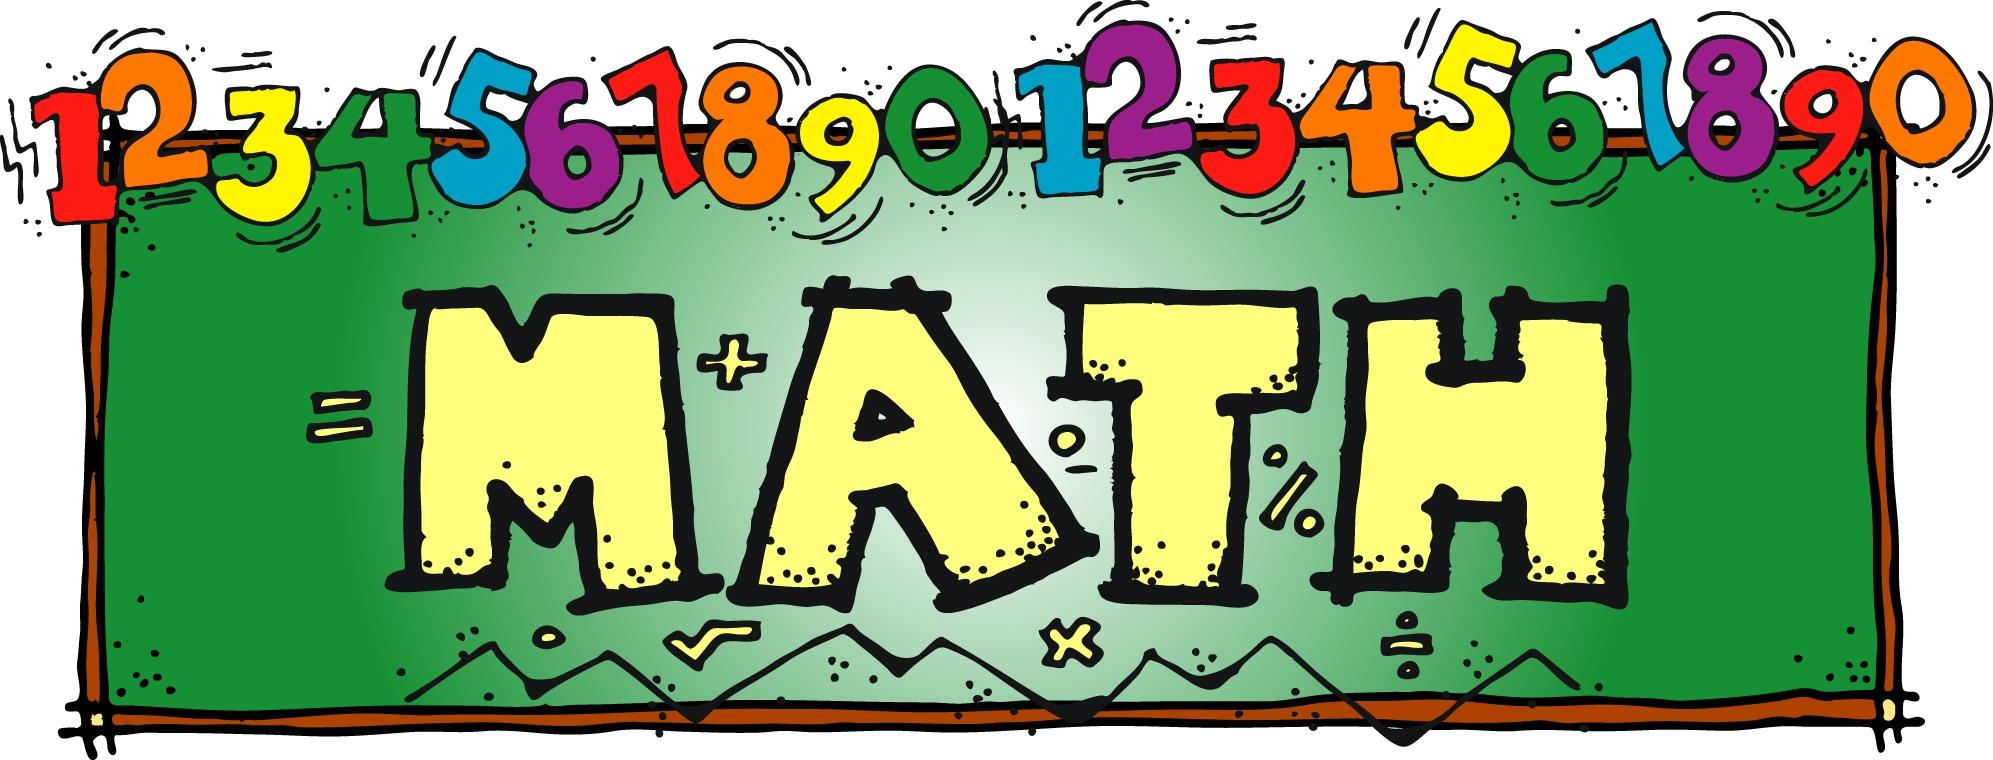 Math Vocabulary Clipart-Math Vocabulary Clipart-12